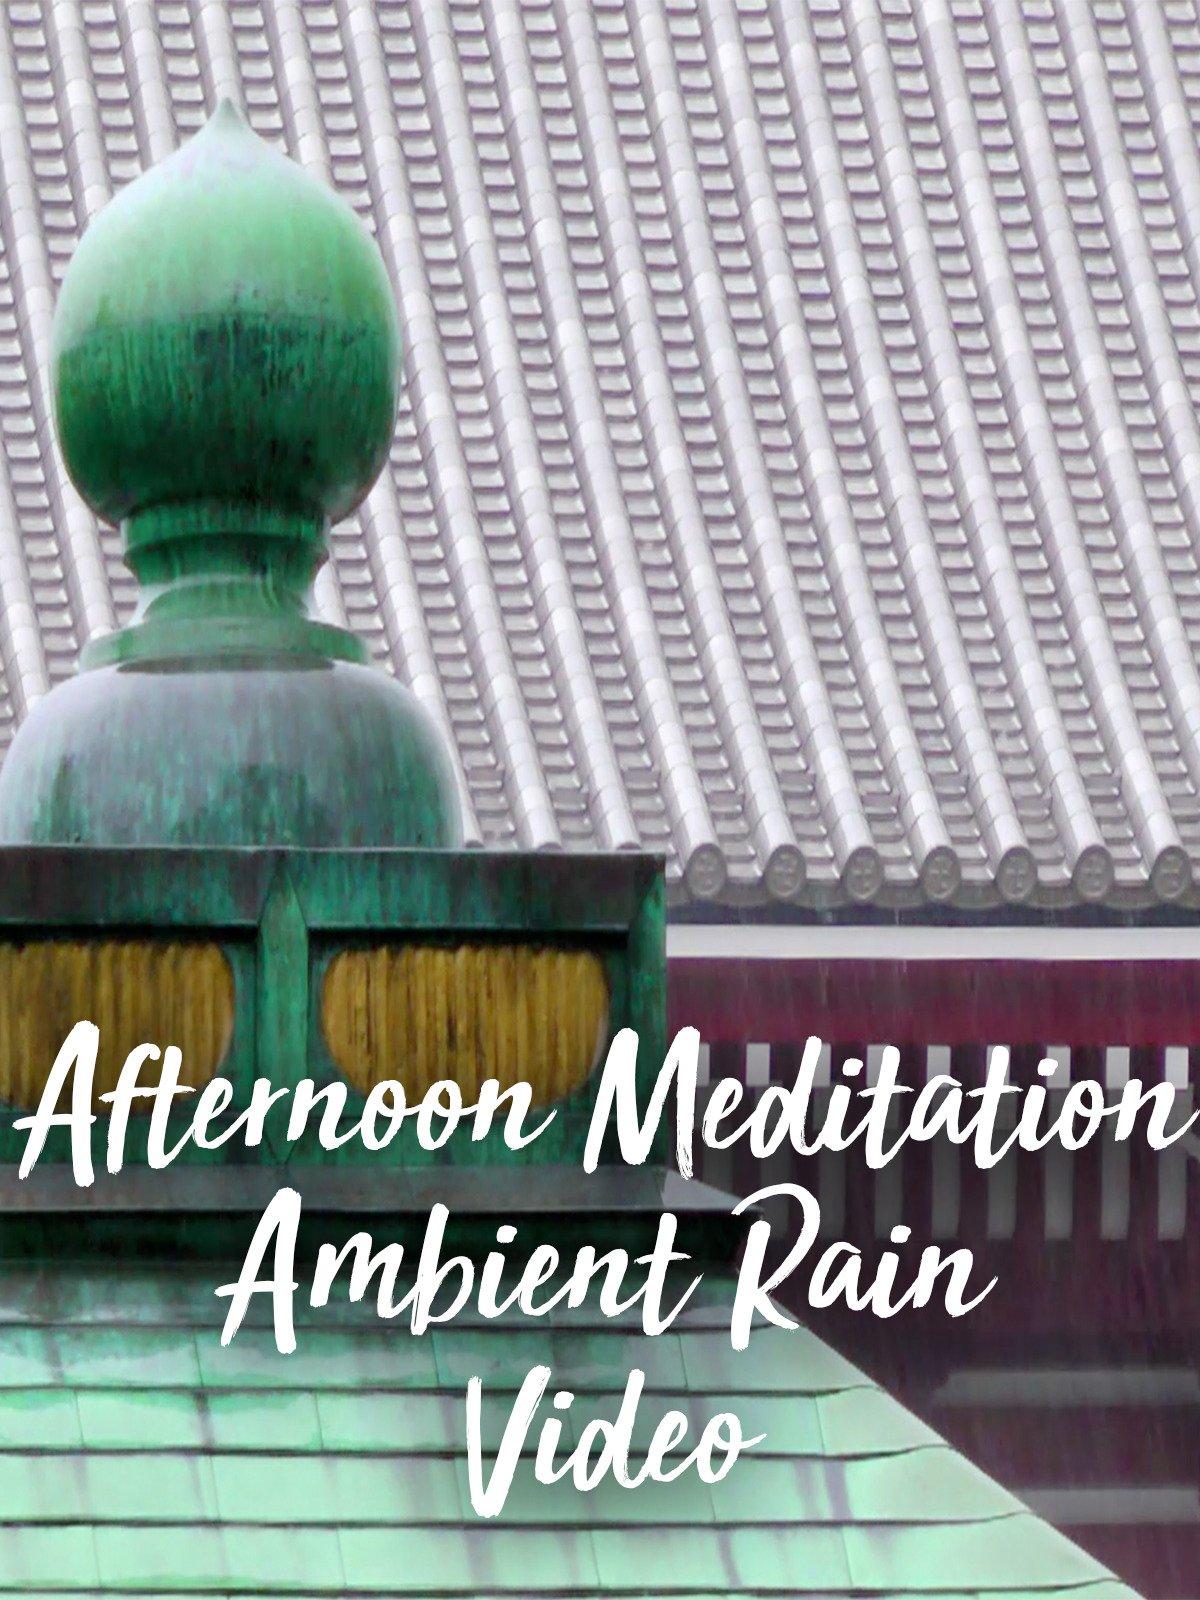 Afternoon Meditation Ambient Rain Video